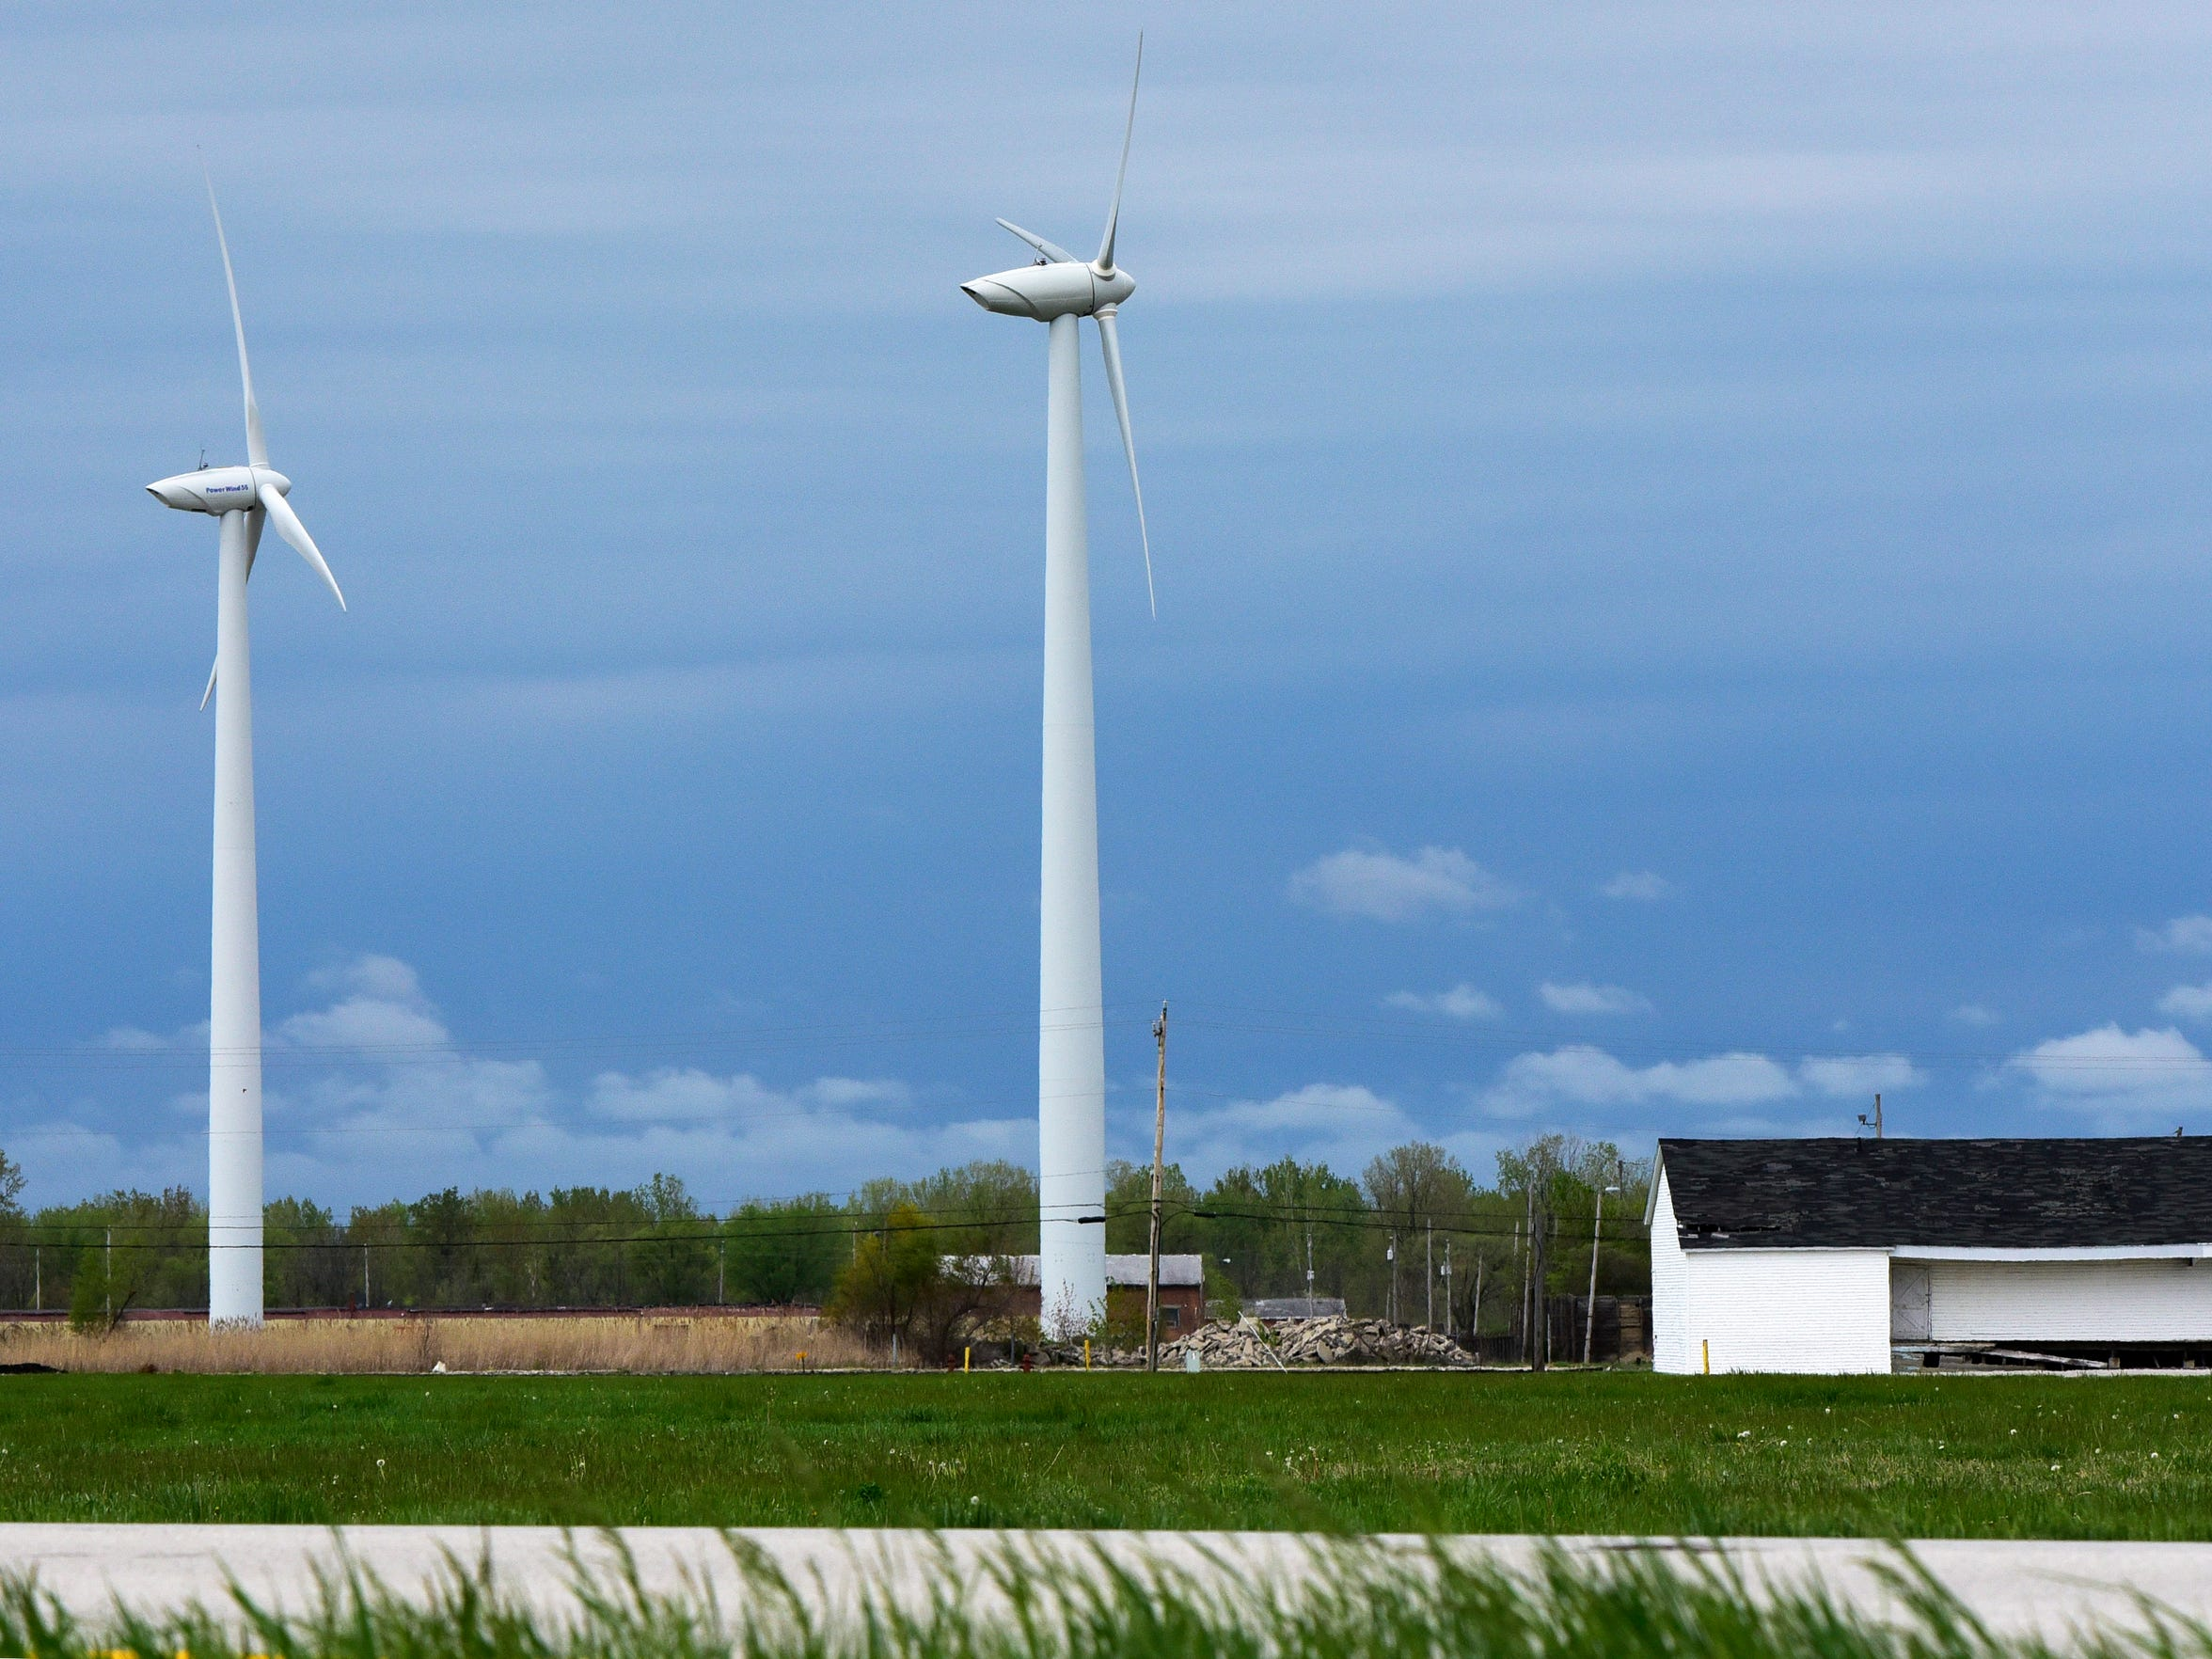 Wind turbines have been built in Port Clinton but bird